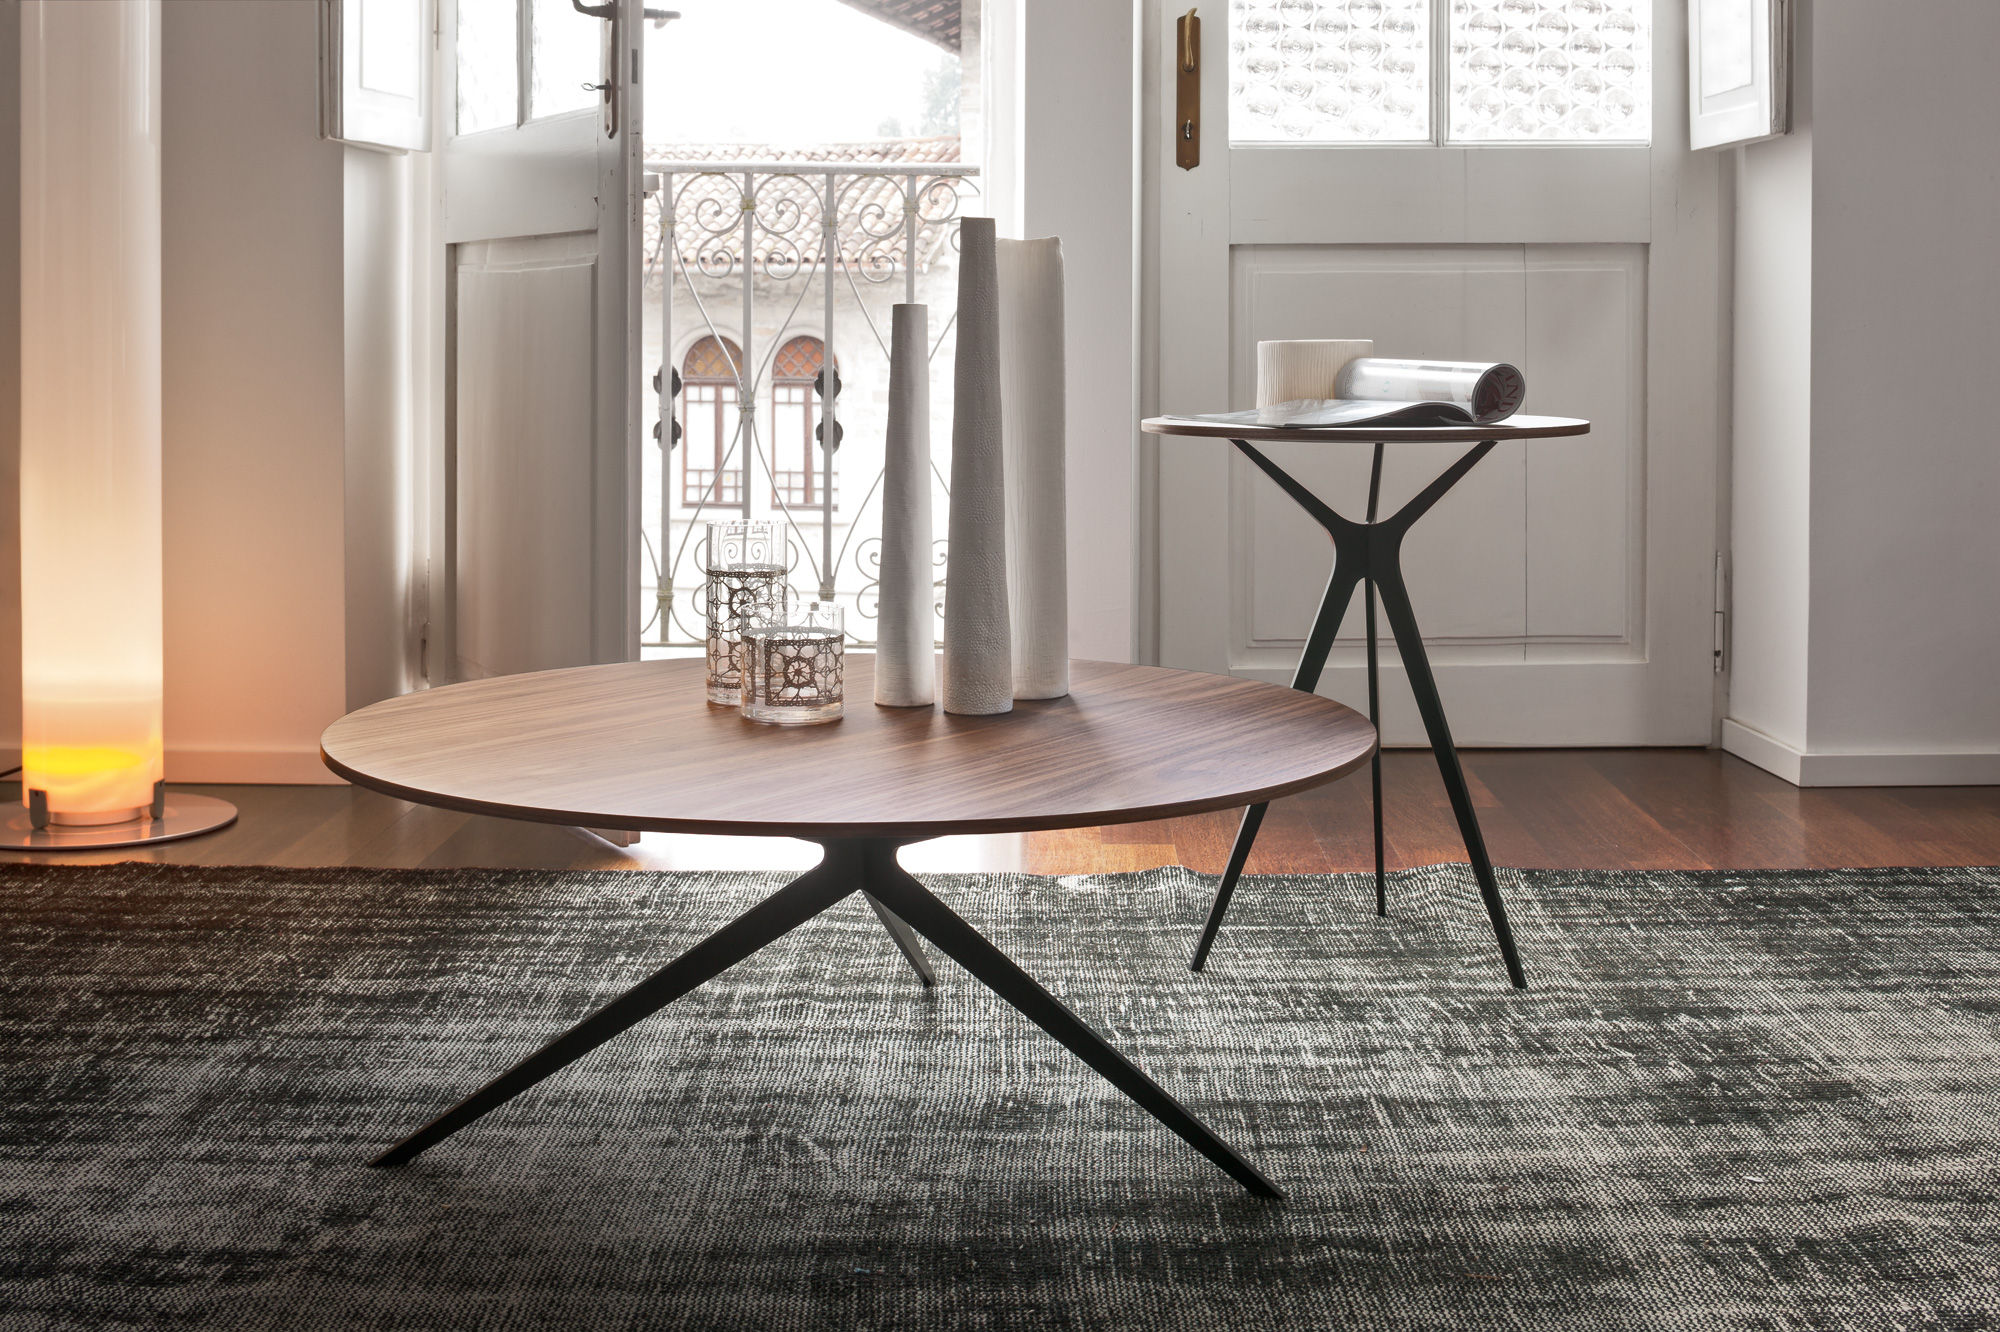 Tonin casa tree 6298 tavolini - Tavolini tonin casa ...